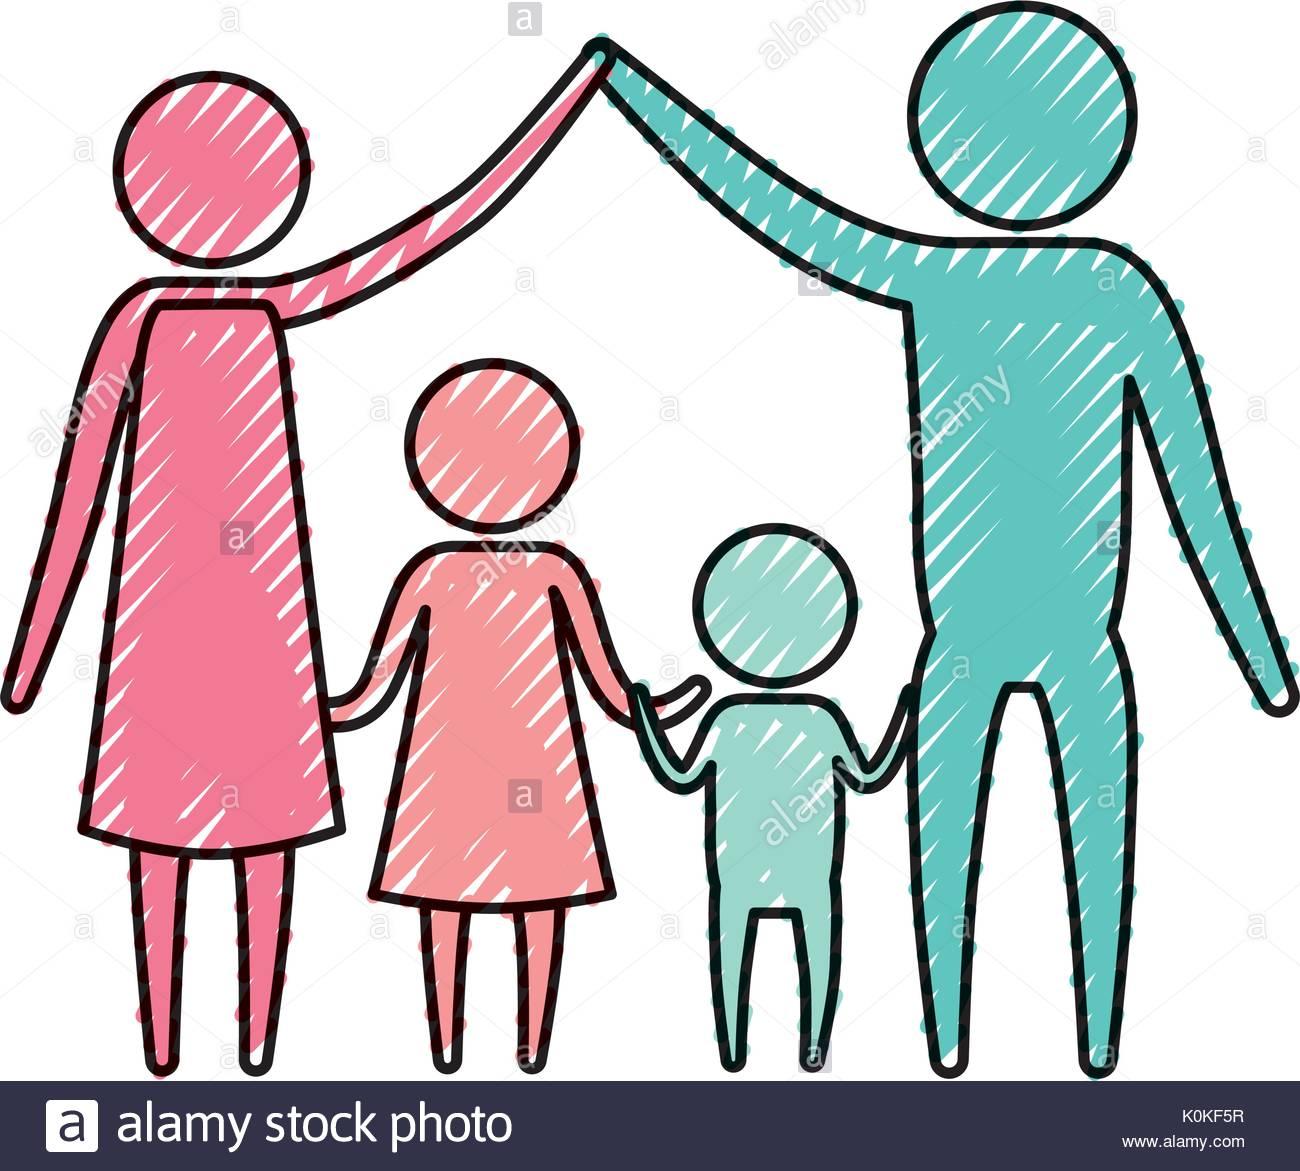 1300x1171 Color Crayon Silhouette Pictogram Couple Parents Holding Hands Up